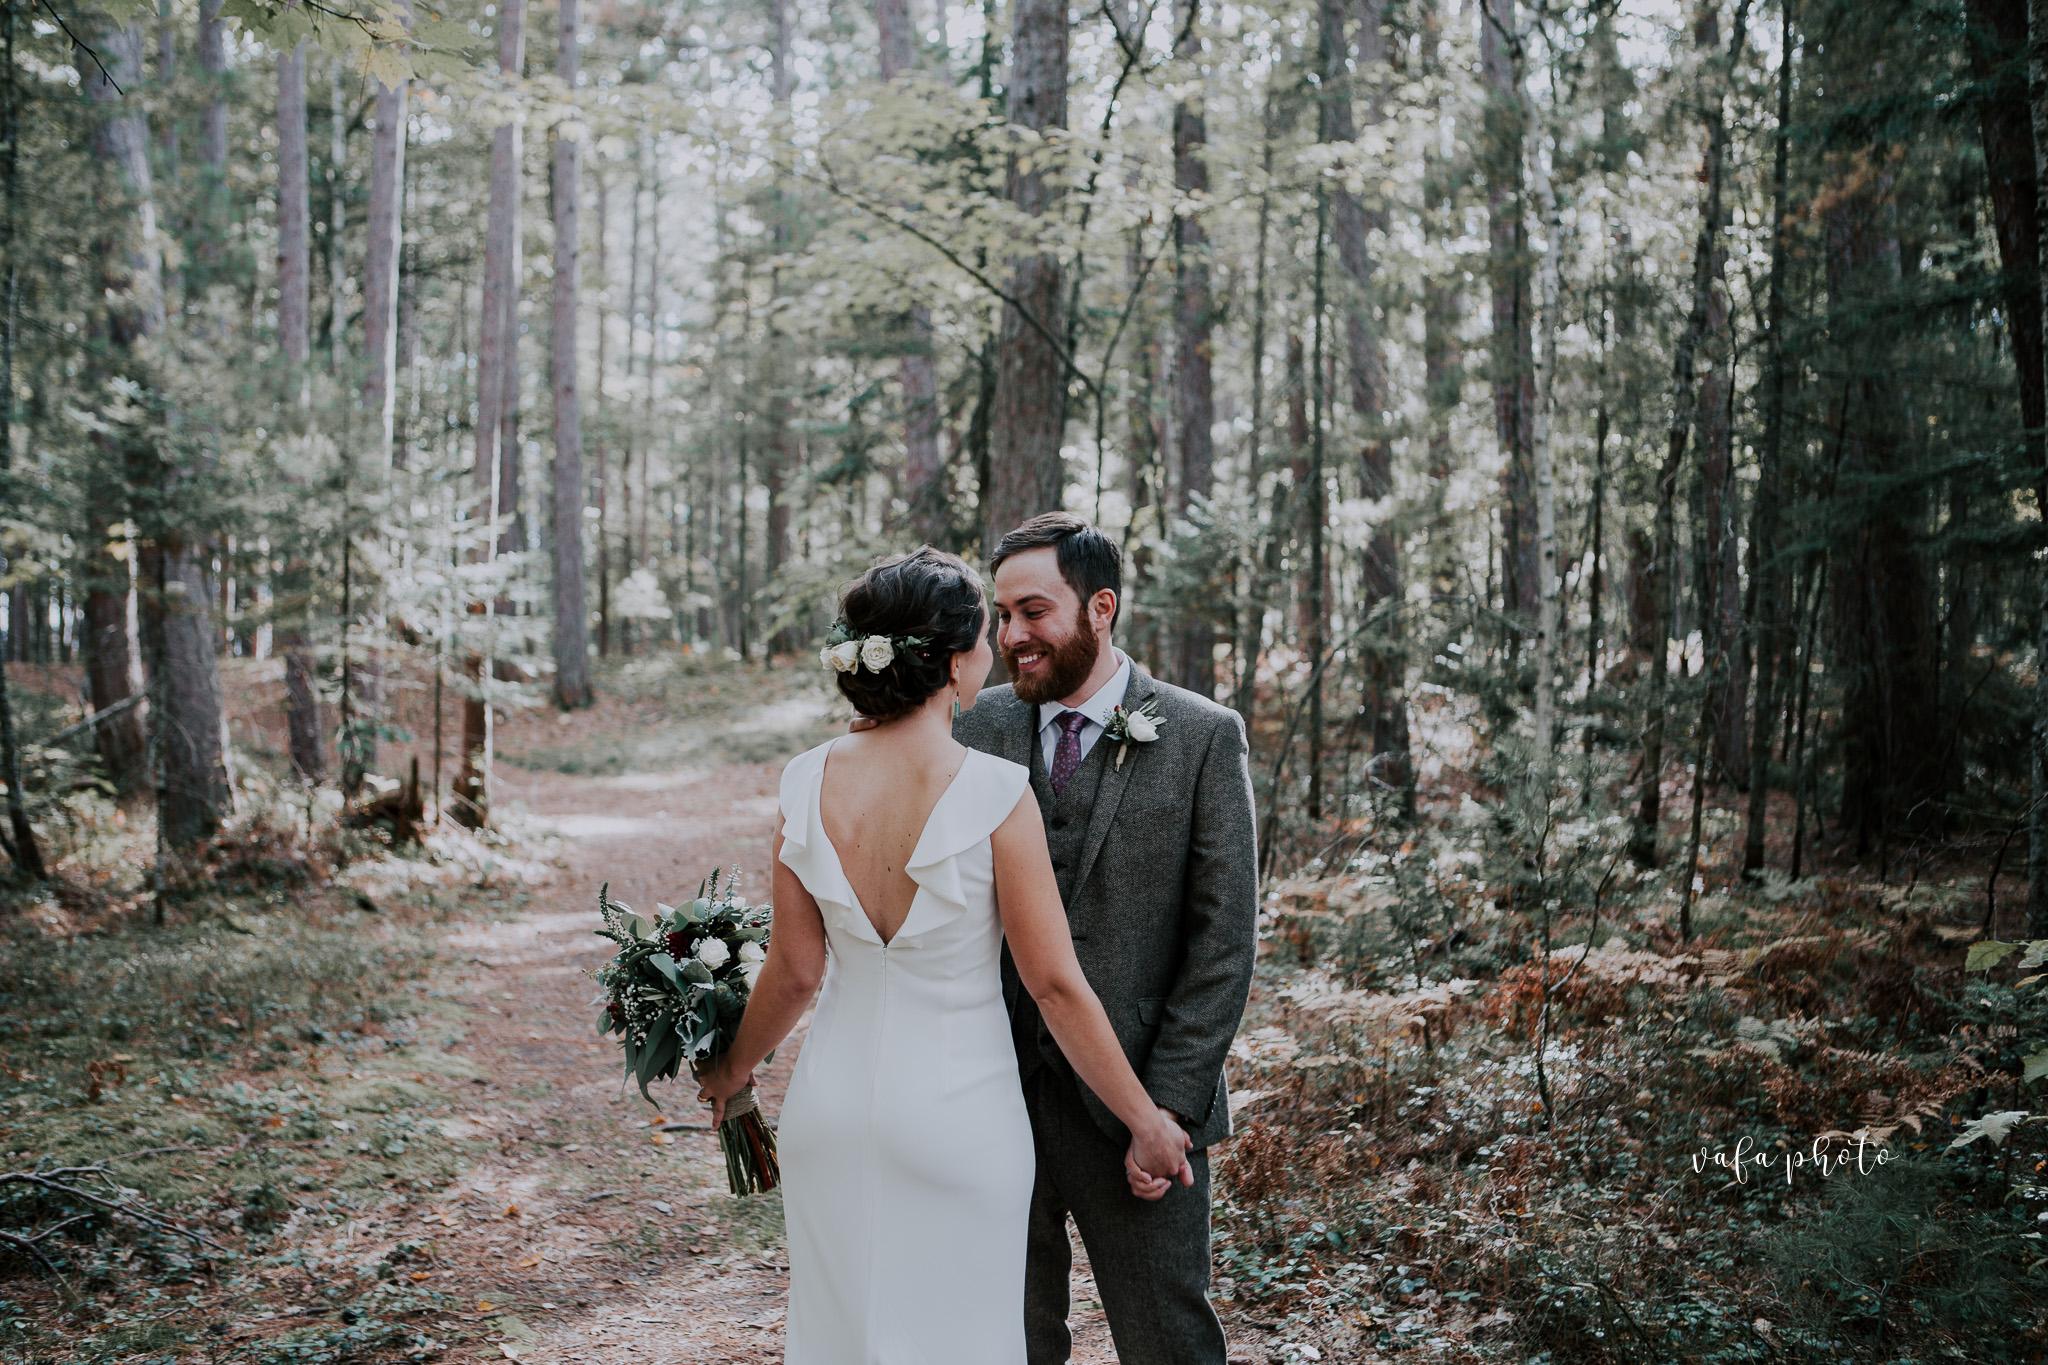 Little-Presque-Isle-Michigan-Wedding-Kim-Kyle-Vafa-Photo-68.jpg